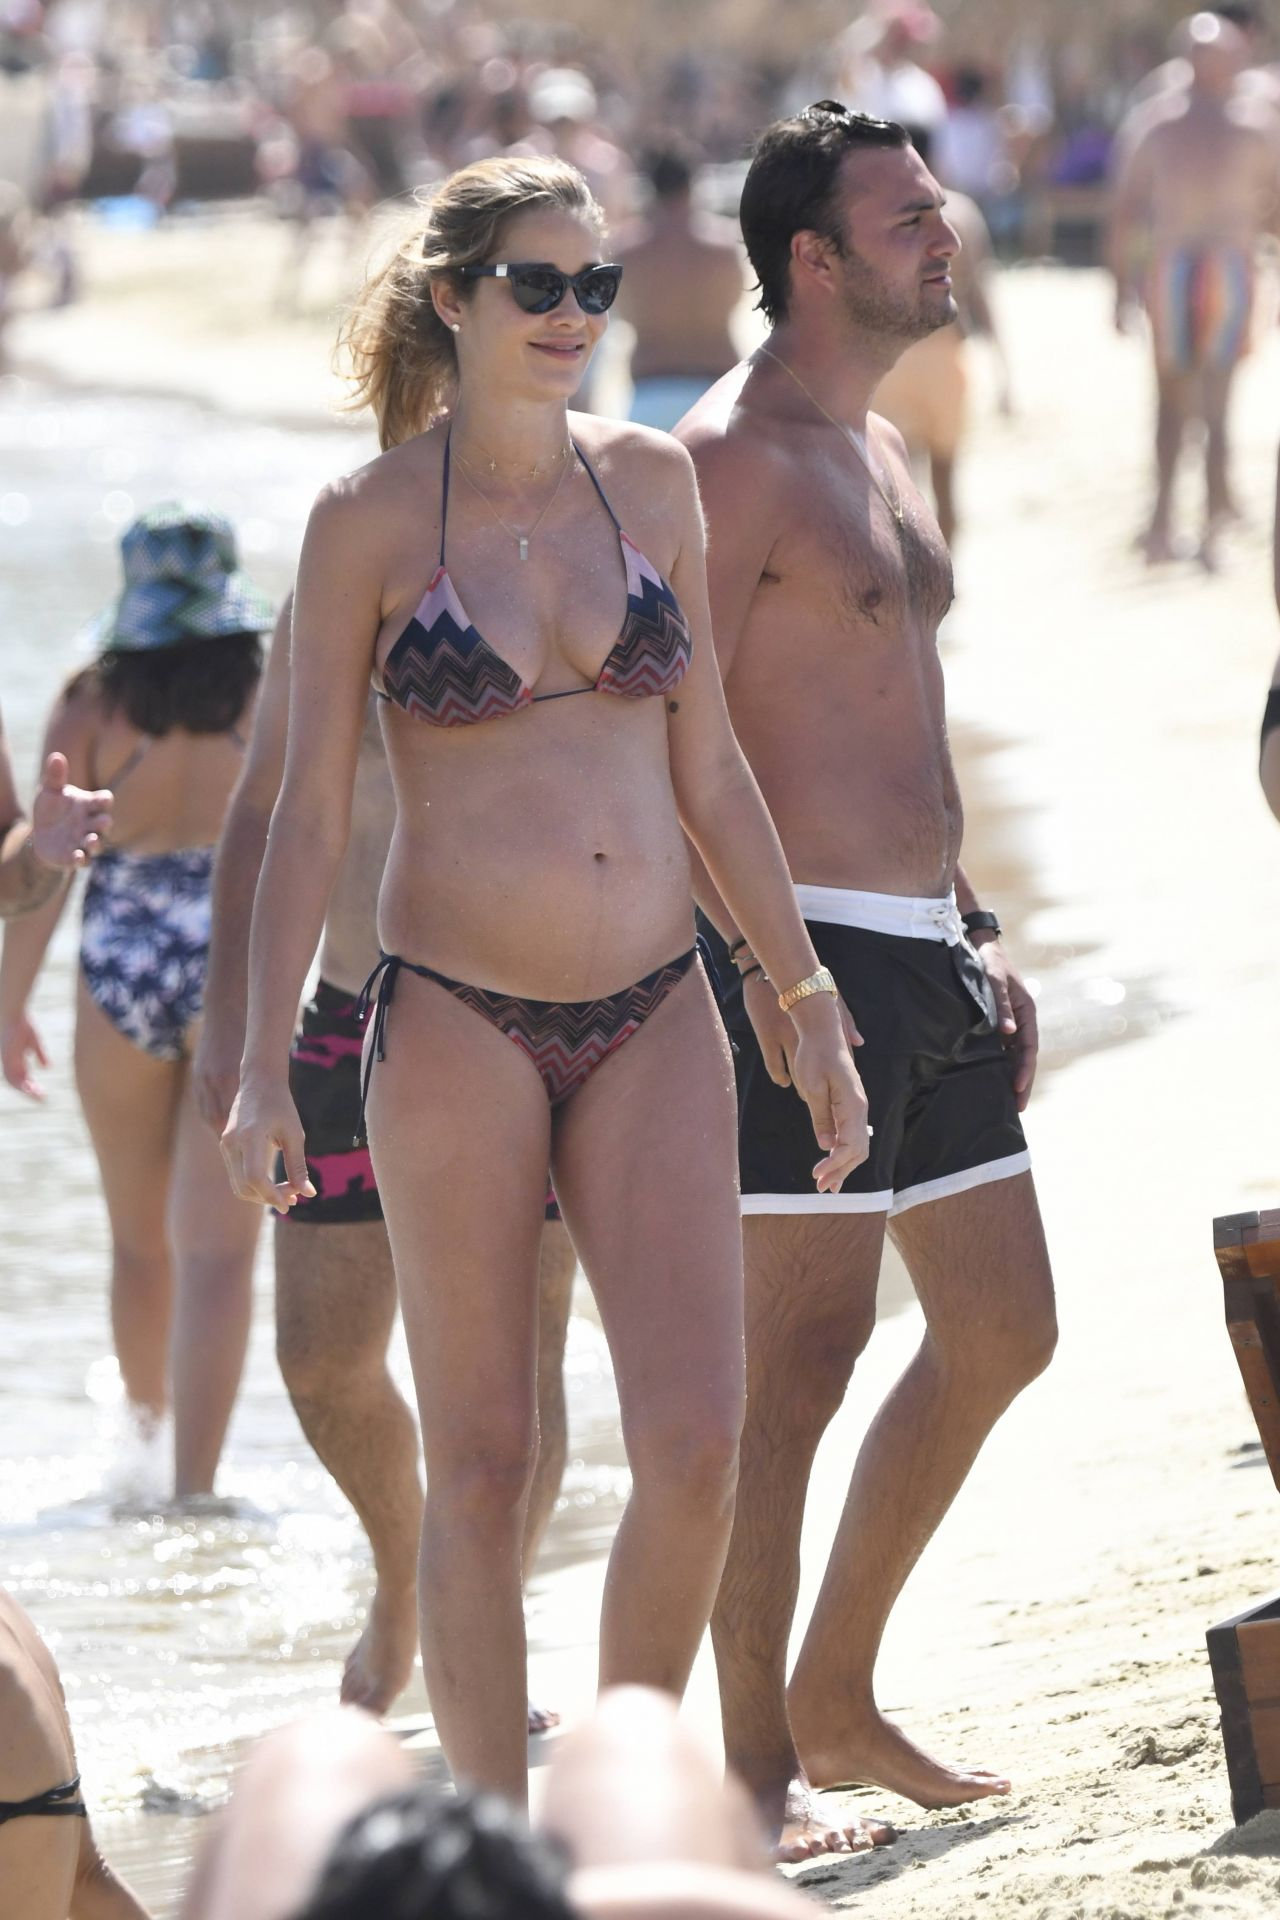 alessandra-ambrosio-and-ana-beatriz-barros-bikini-candids-mykonos-greece-07-01-2017-21.jpg (1280×1920)